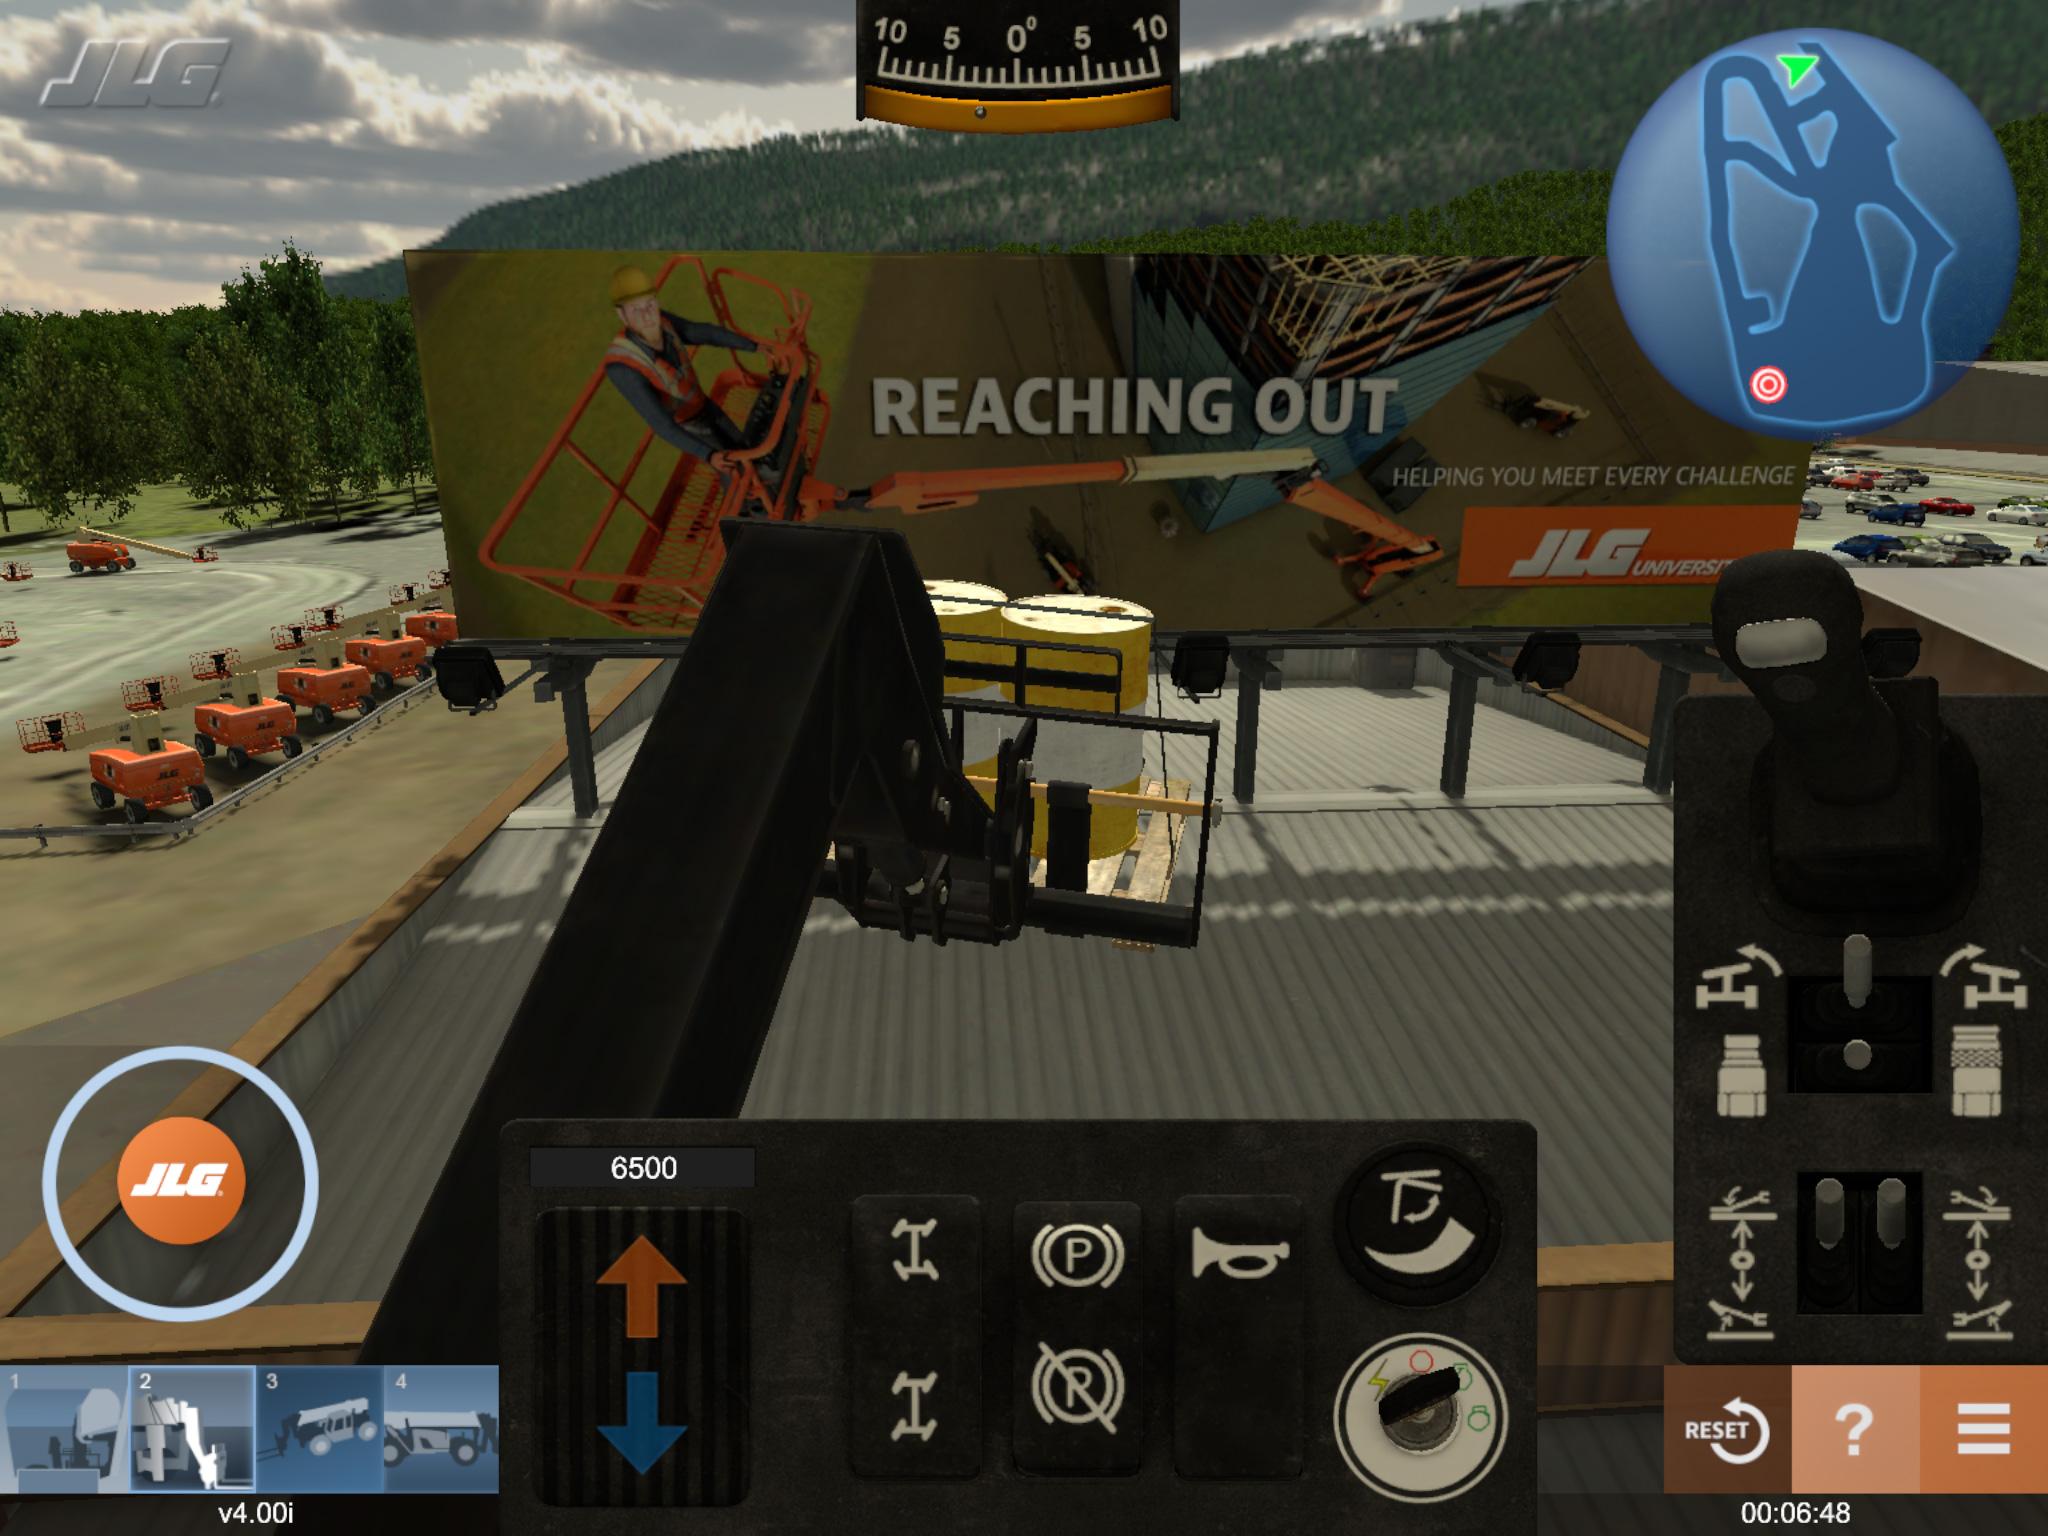 JLG Operator Training Simulator